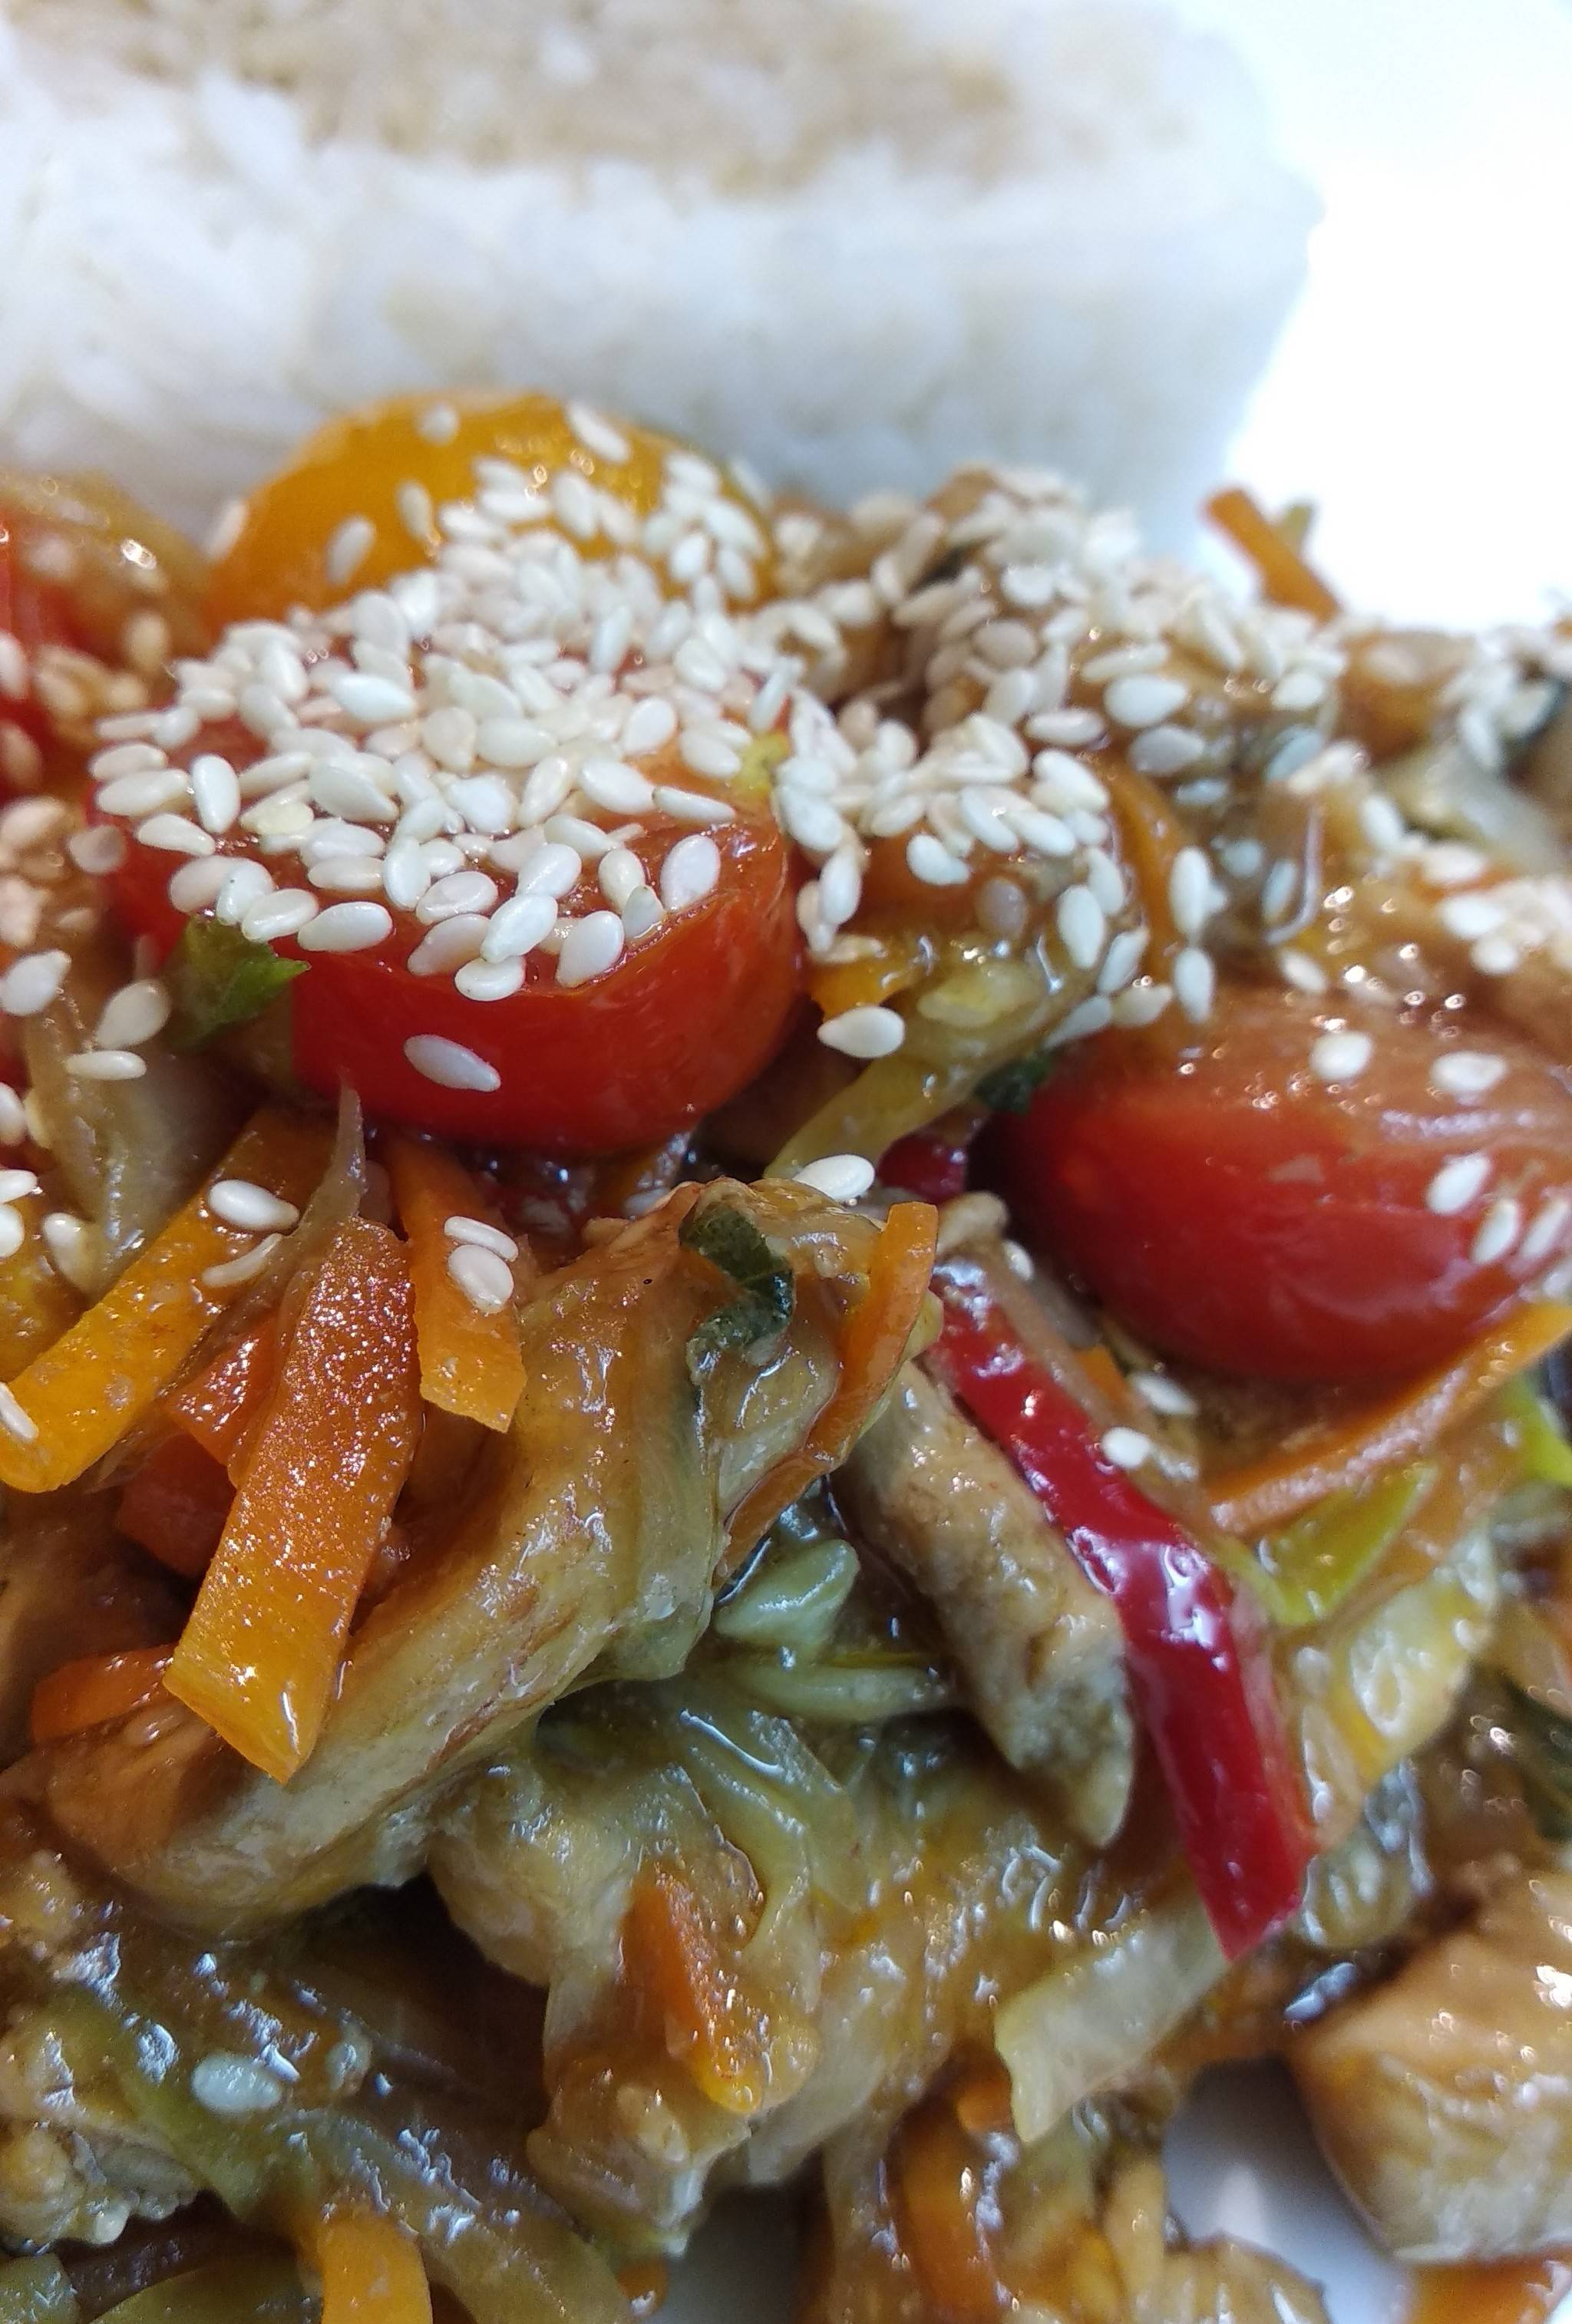 Свинина стир-фрай (stir fry) с овощами